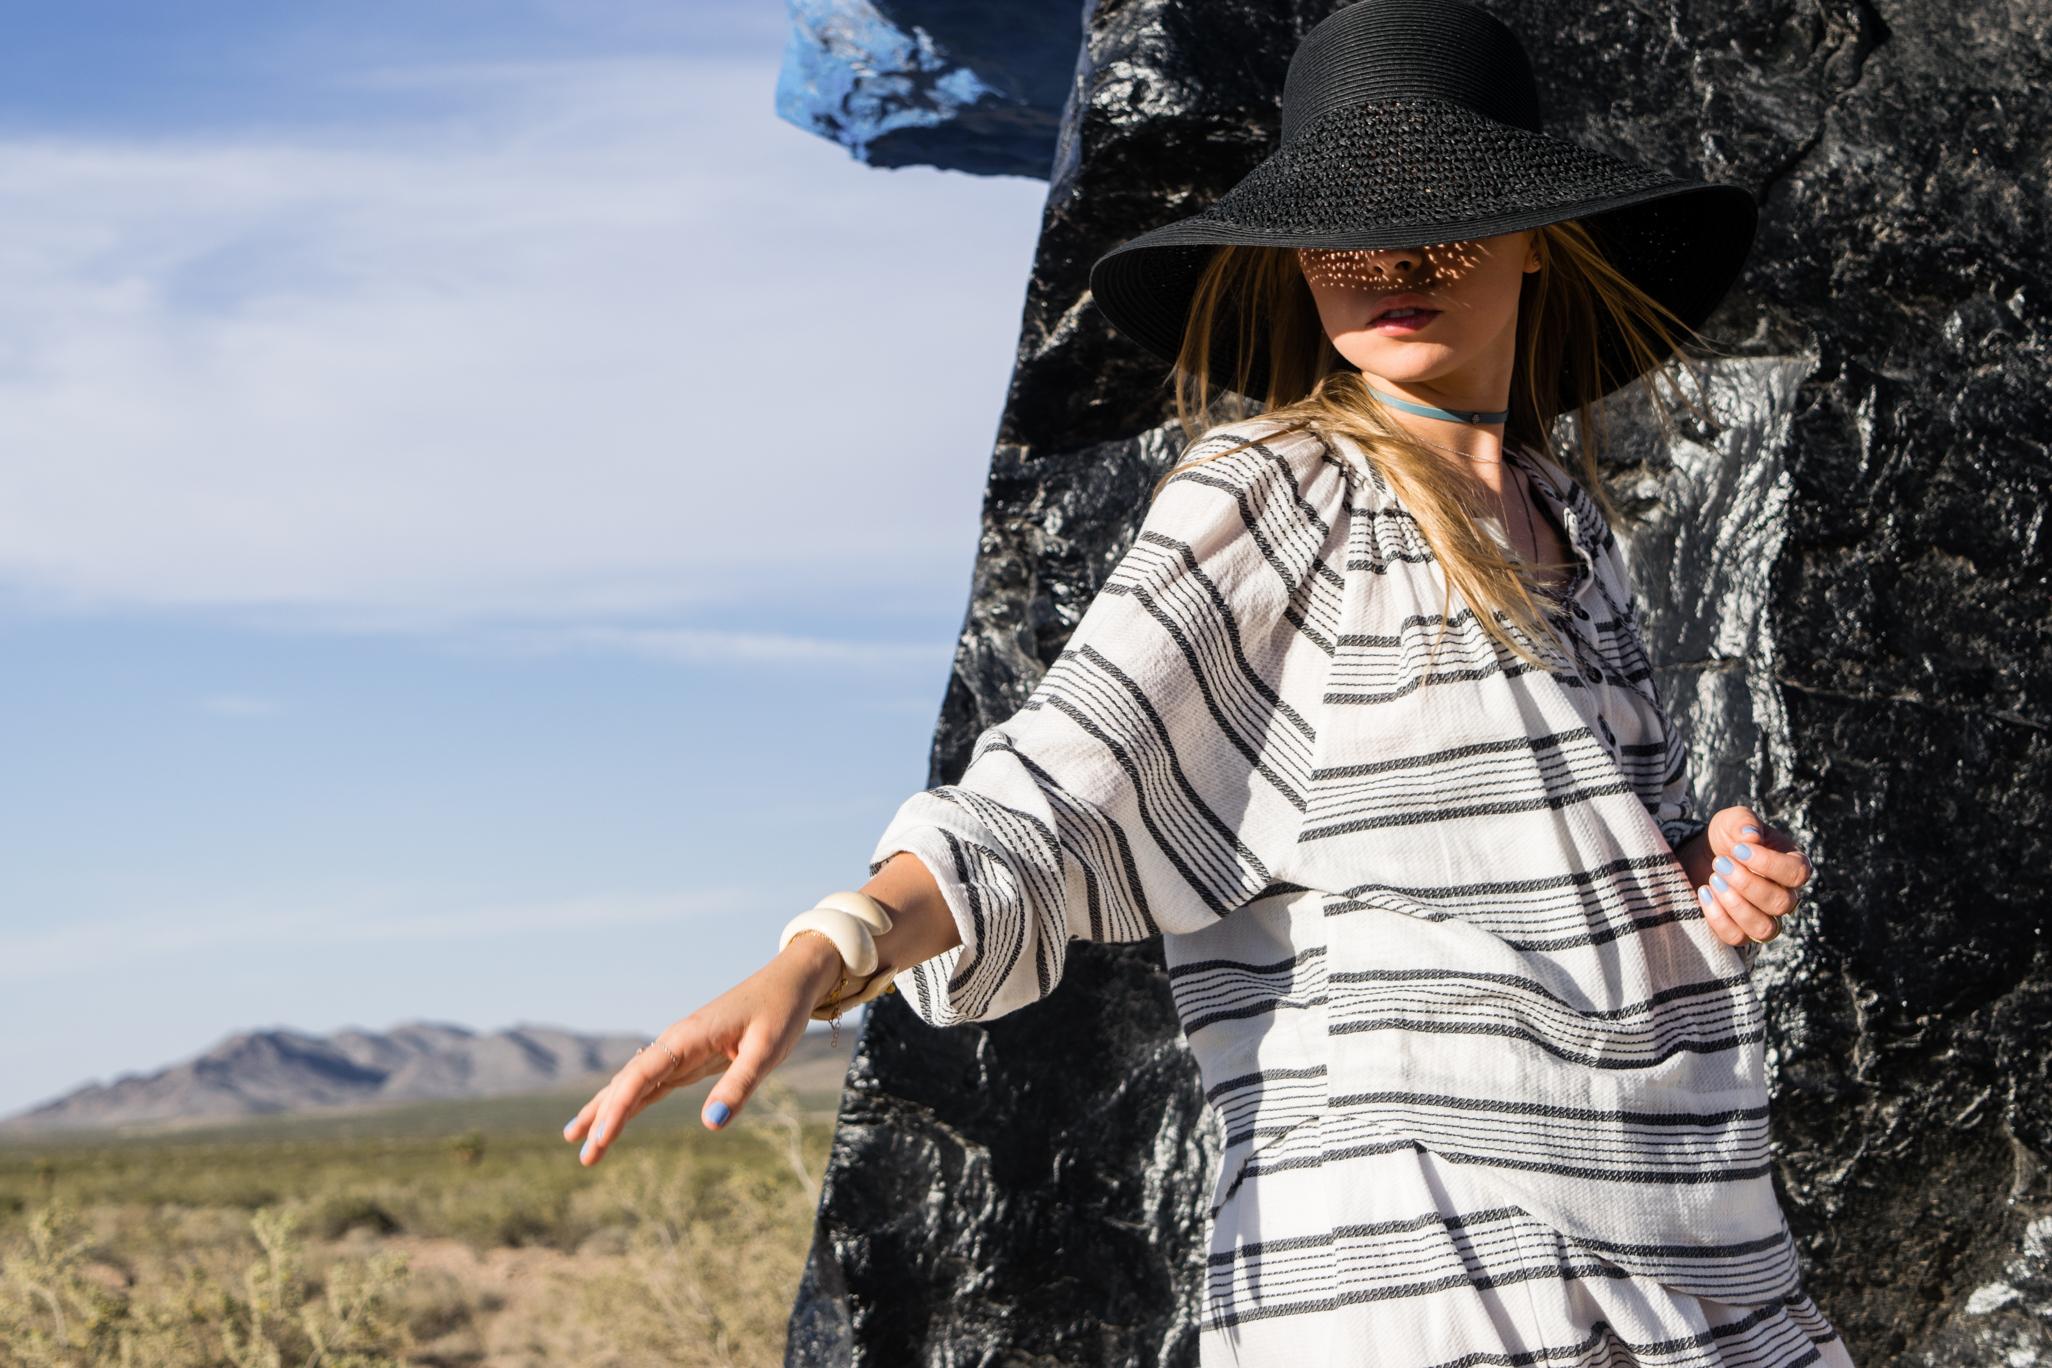 dra clothing nevada 4 blog -5